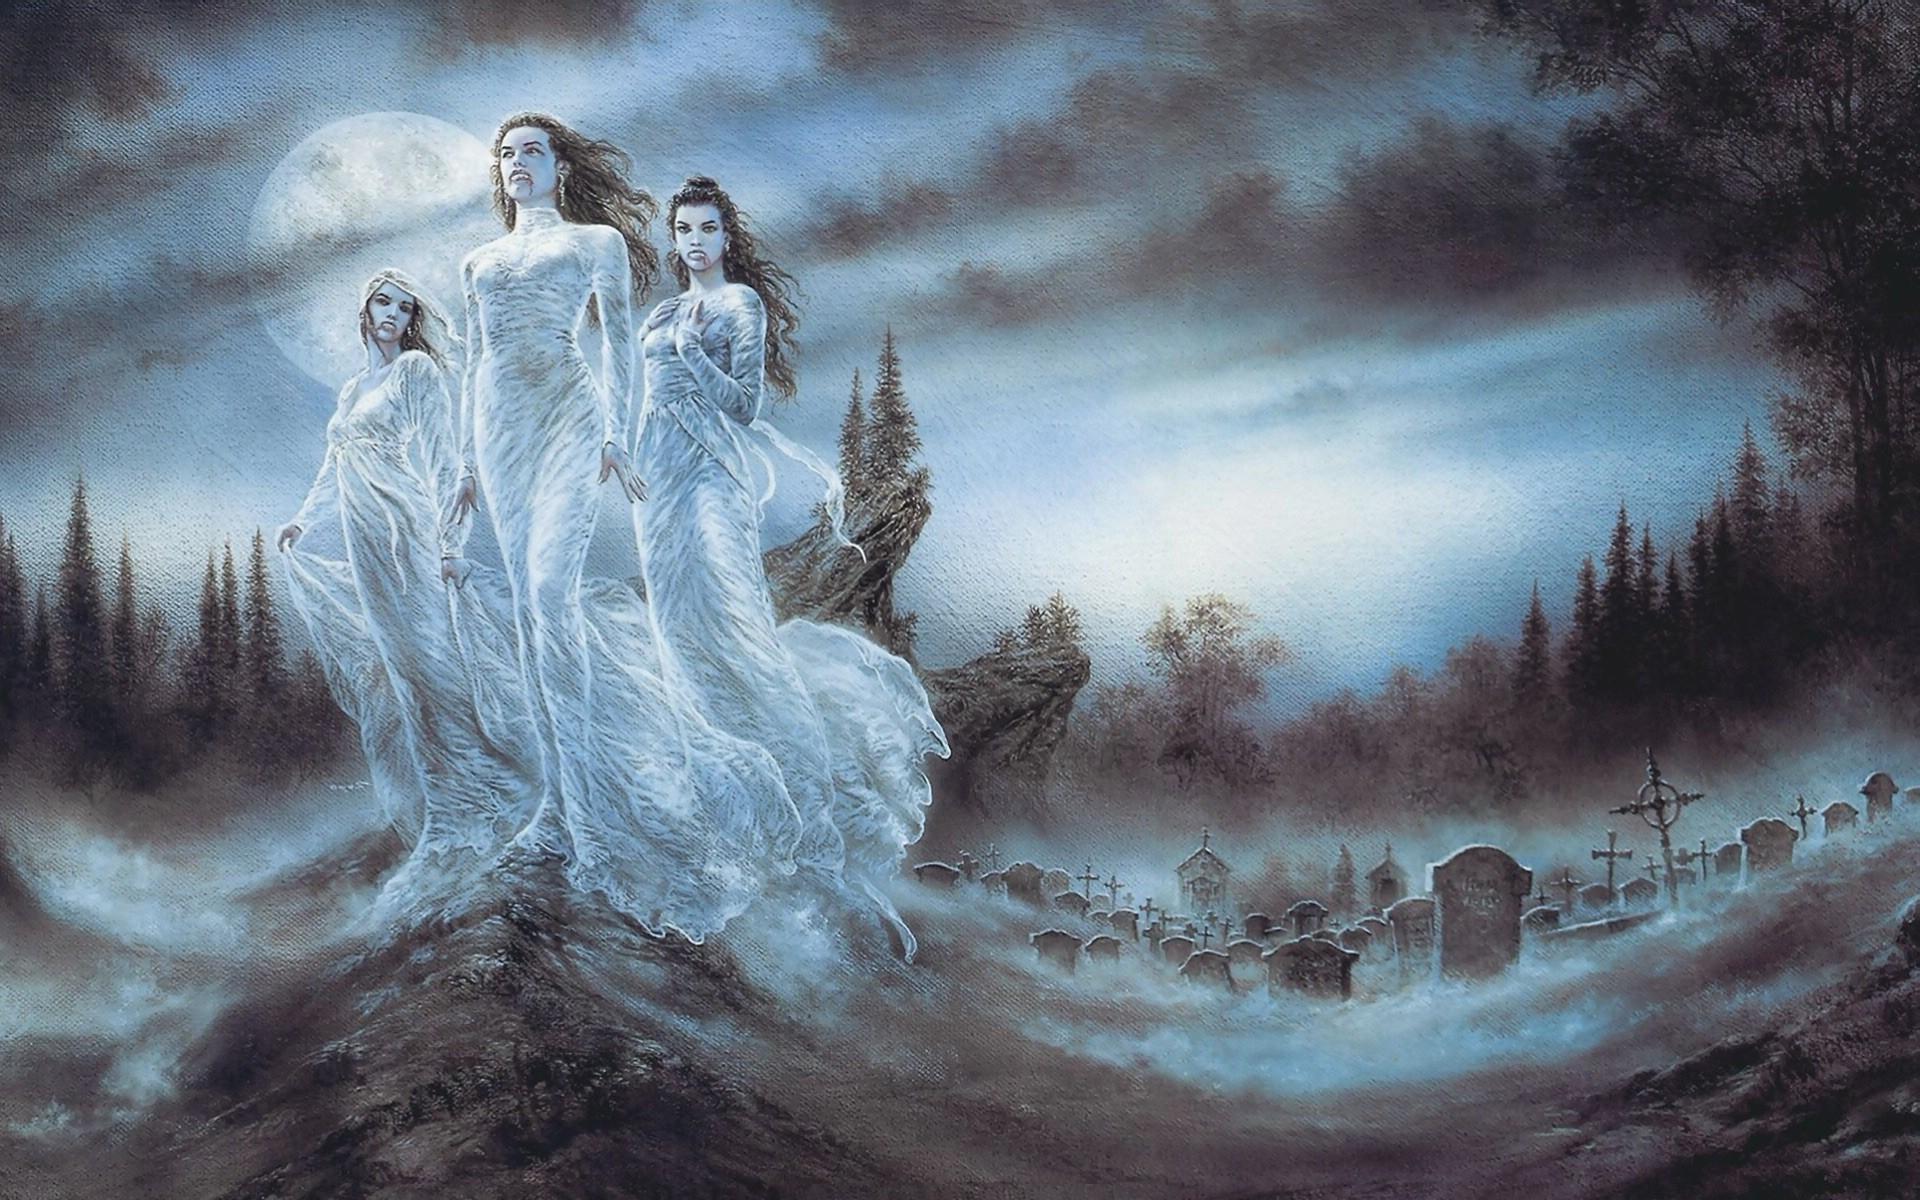 fantasy art winter Luis Royo Freezing wave 1920x1200 px atmospheric phenomenon computer wallpaper